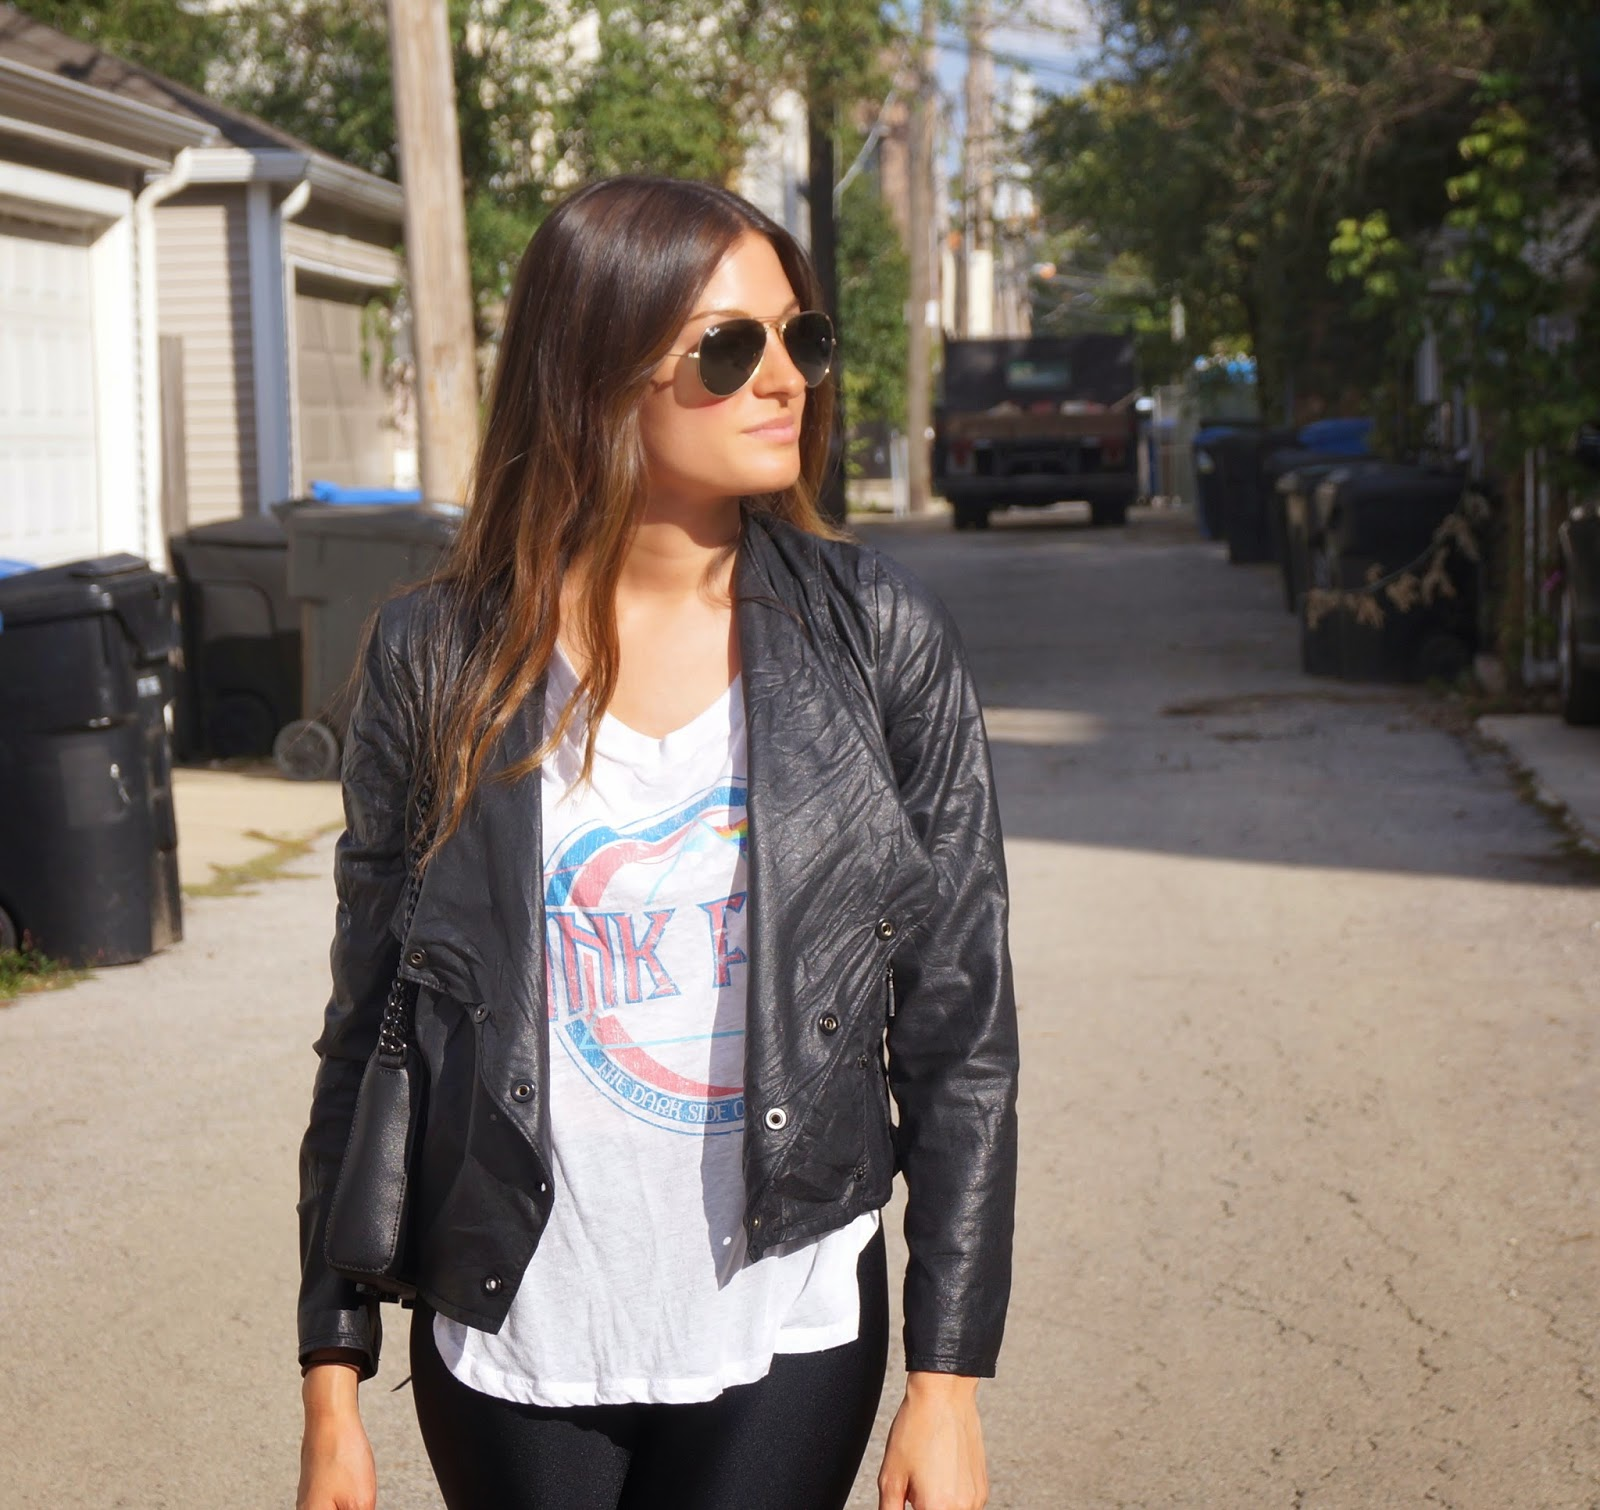 graphic tee + leather jacket